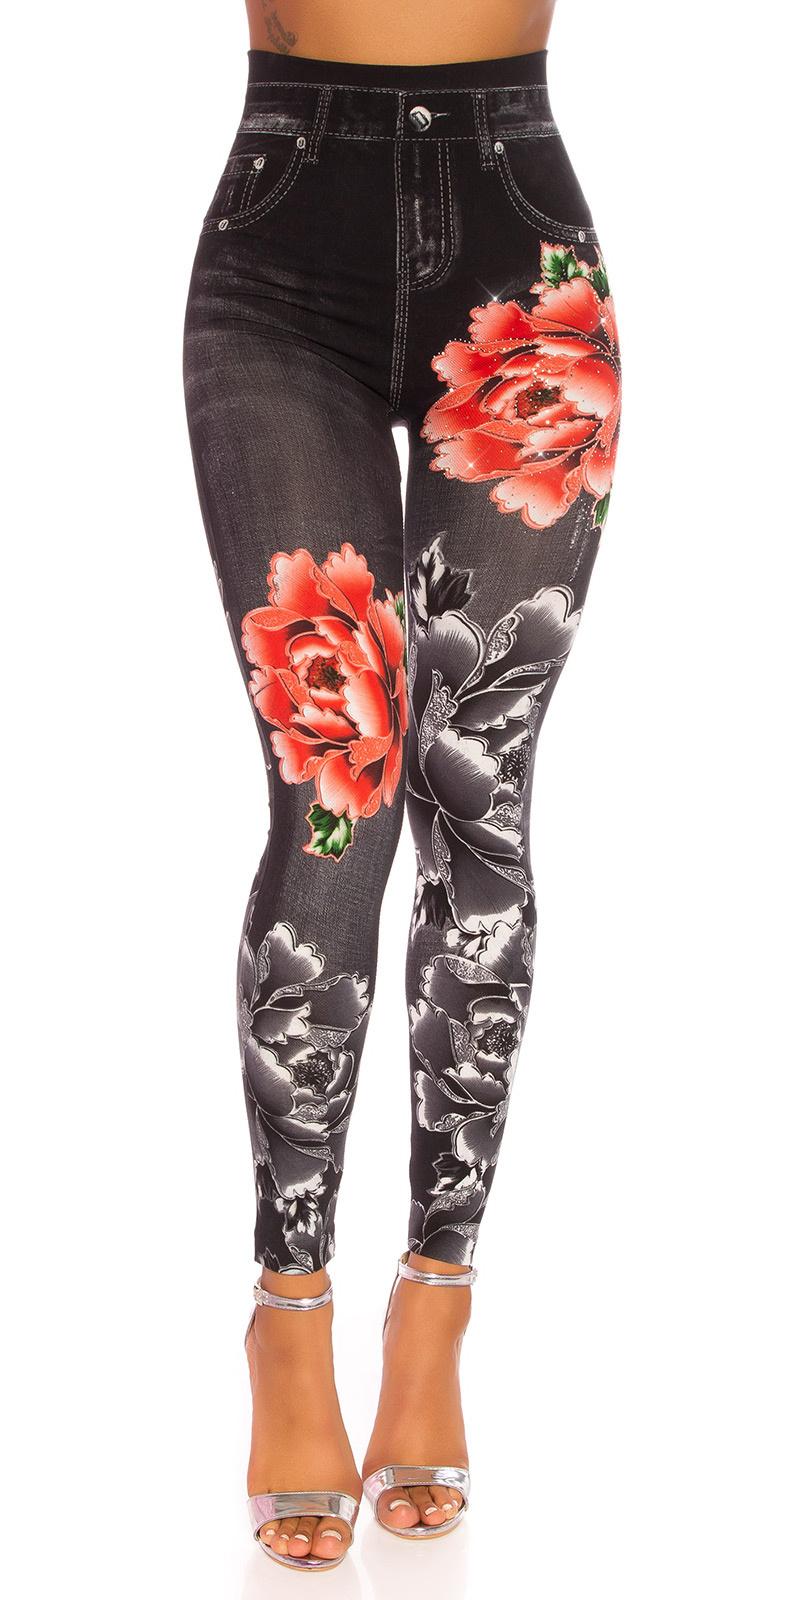 Sexy hoge taille jeanslook leggings zwart